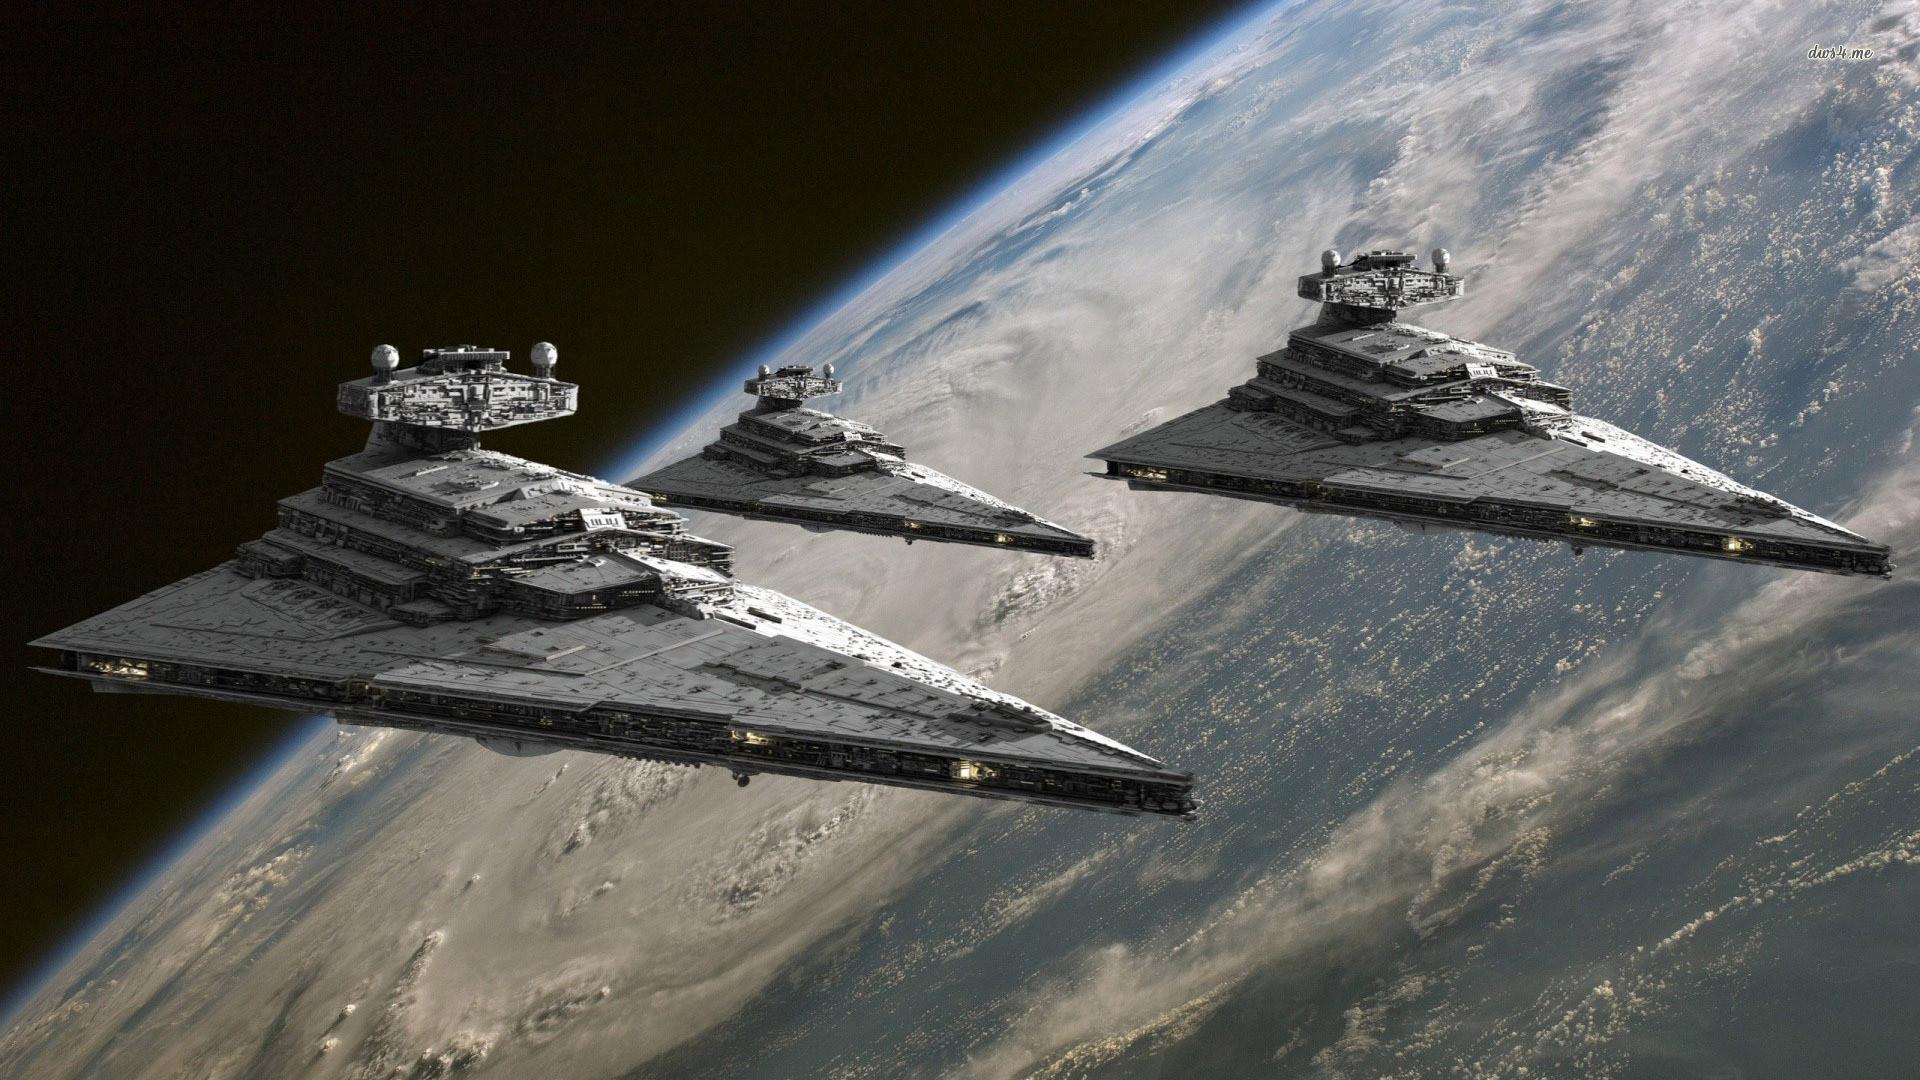 20 Imperial Star Destroyer Wallpaper Destroyers Wars